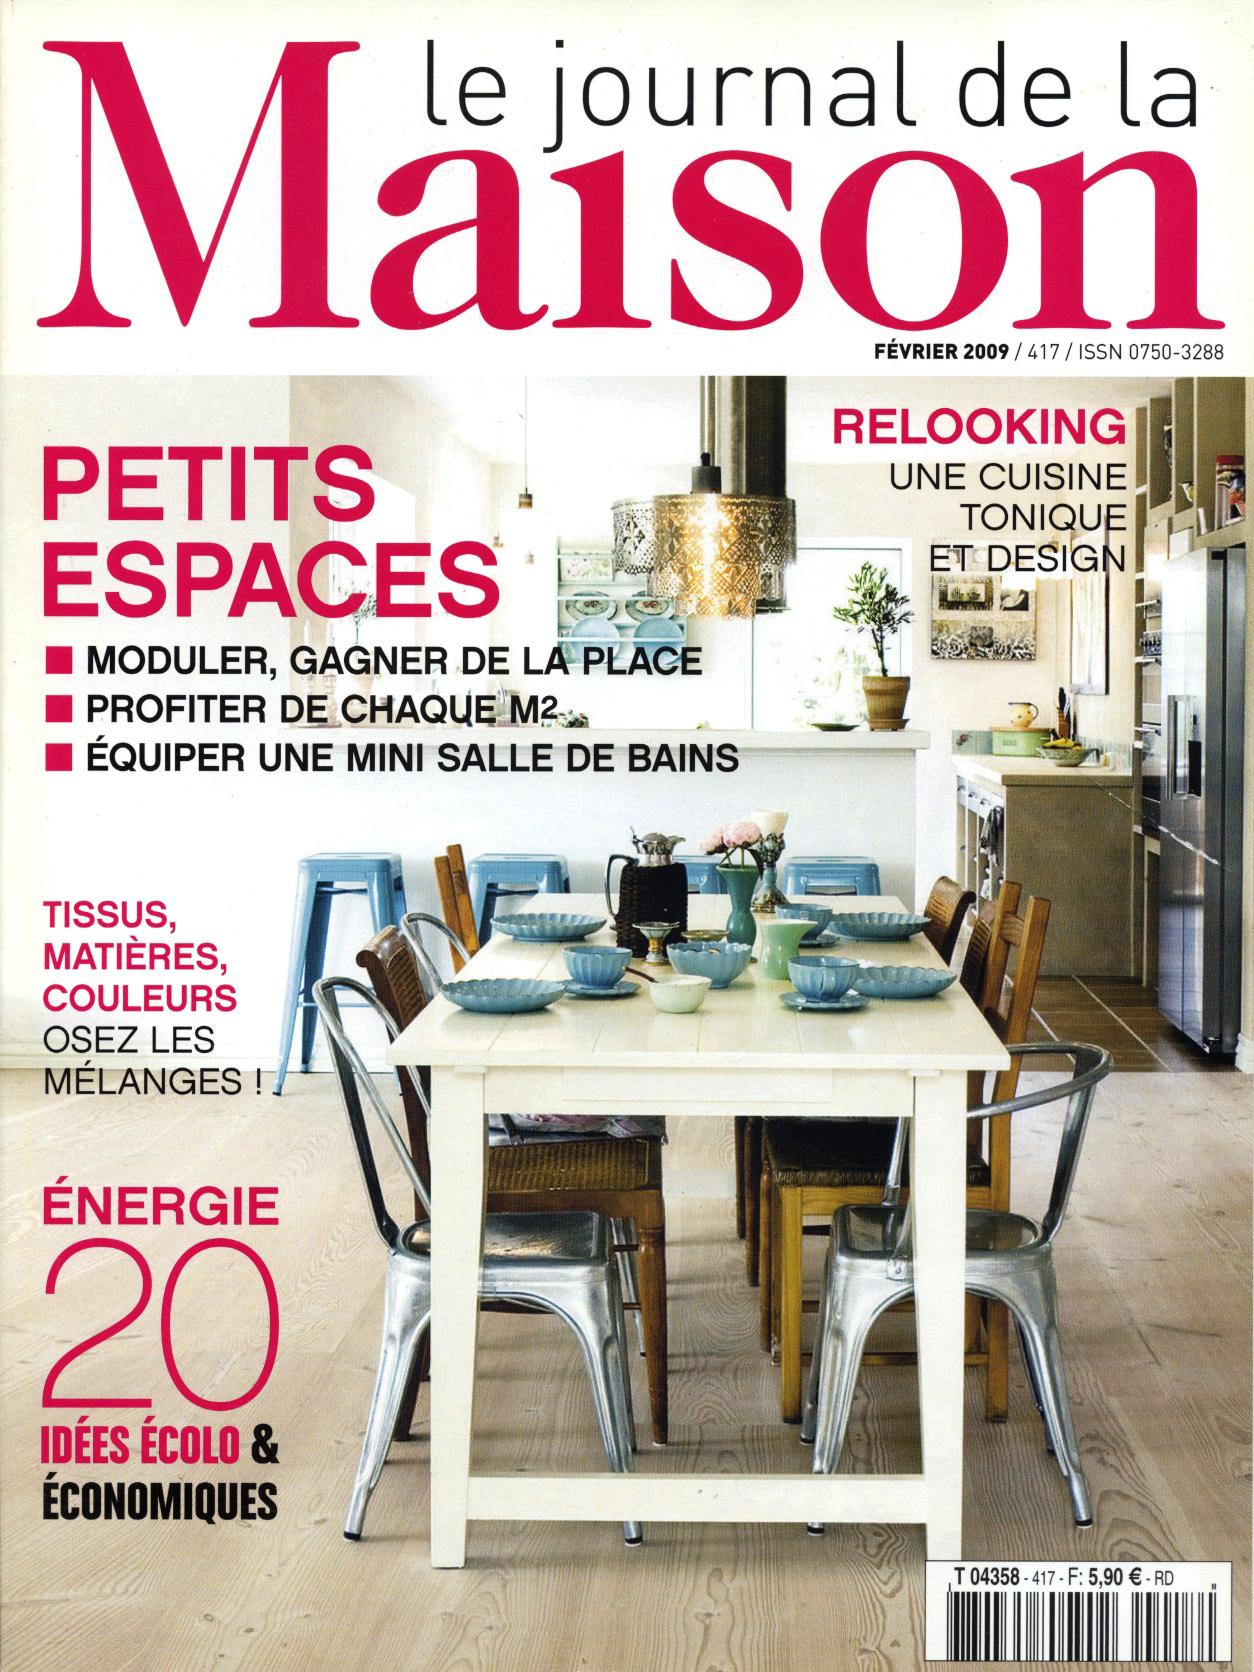 © ghislaine viñas interior design-maison.02.09.jpeg